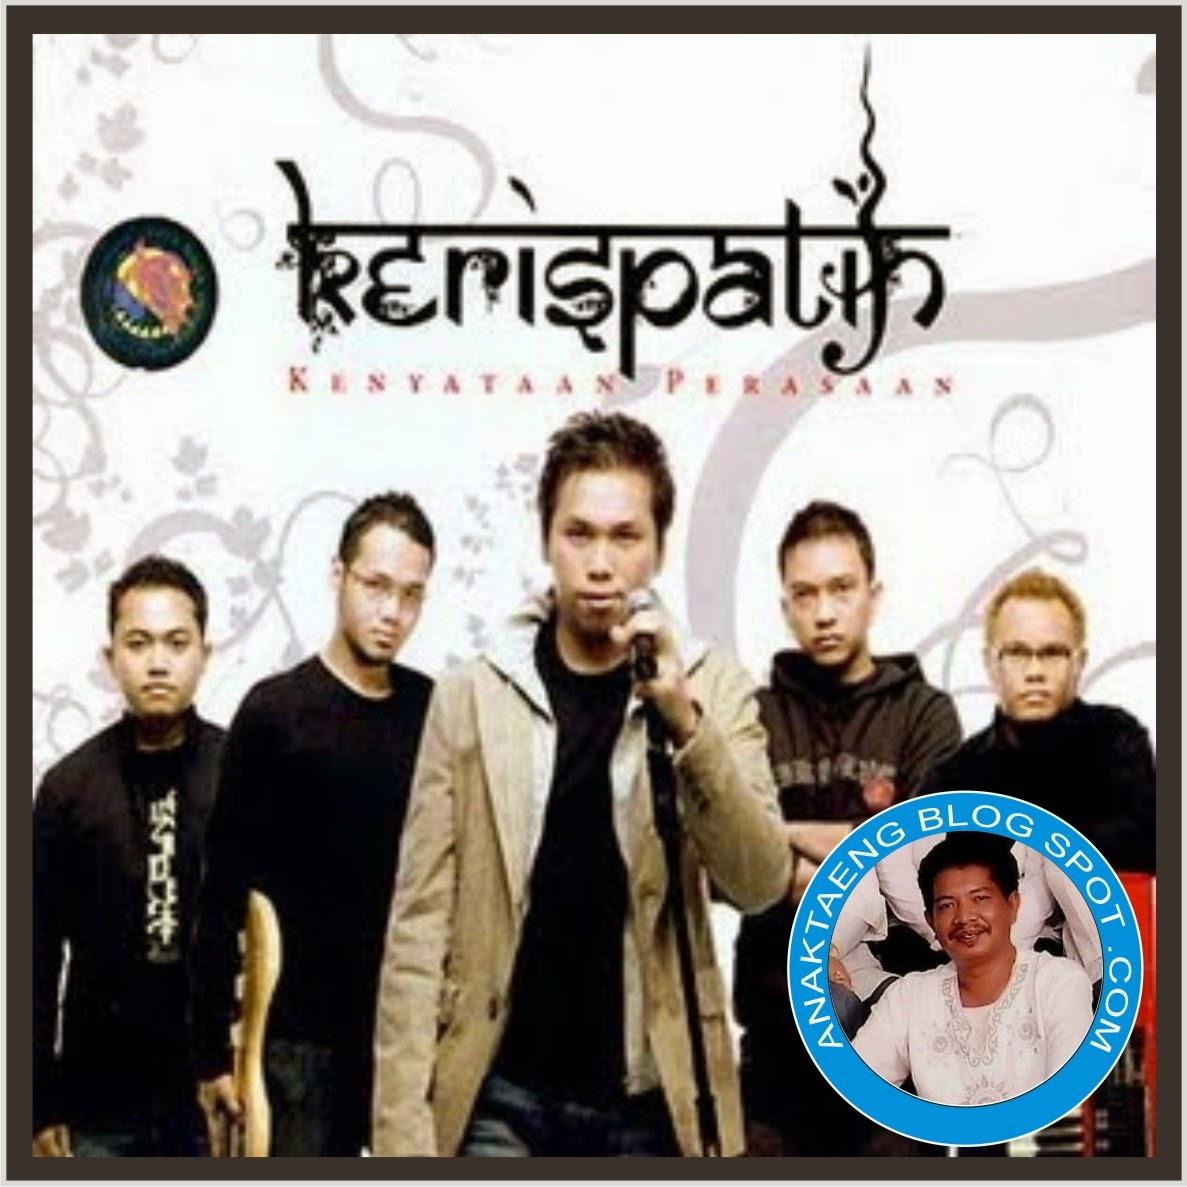 Download Lagu Untuk Dikenang (by Anak Taeng): KERISPATIH